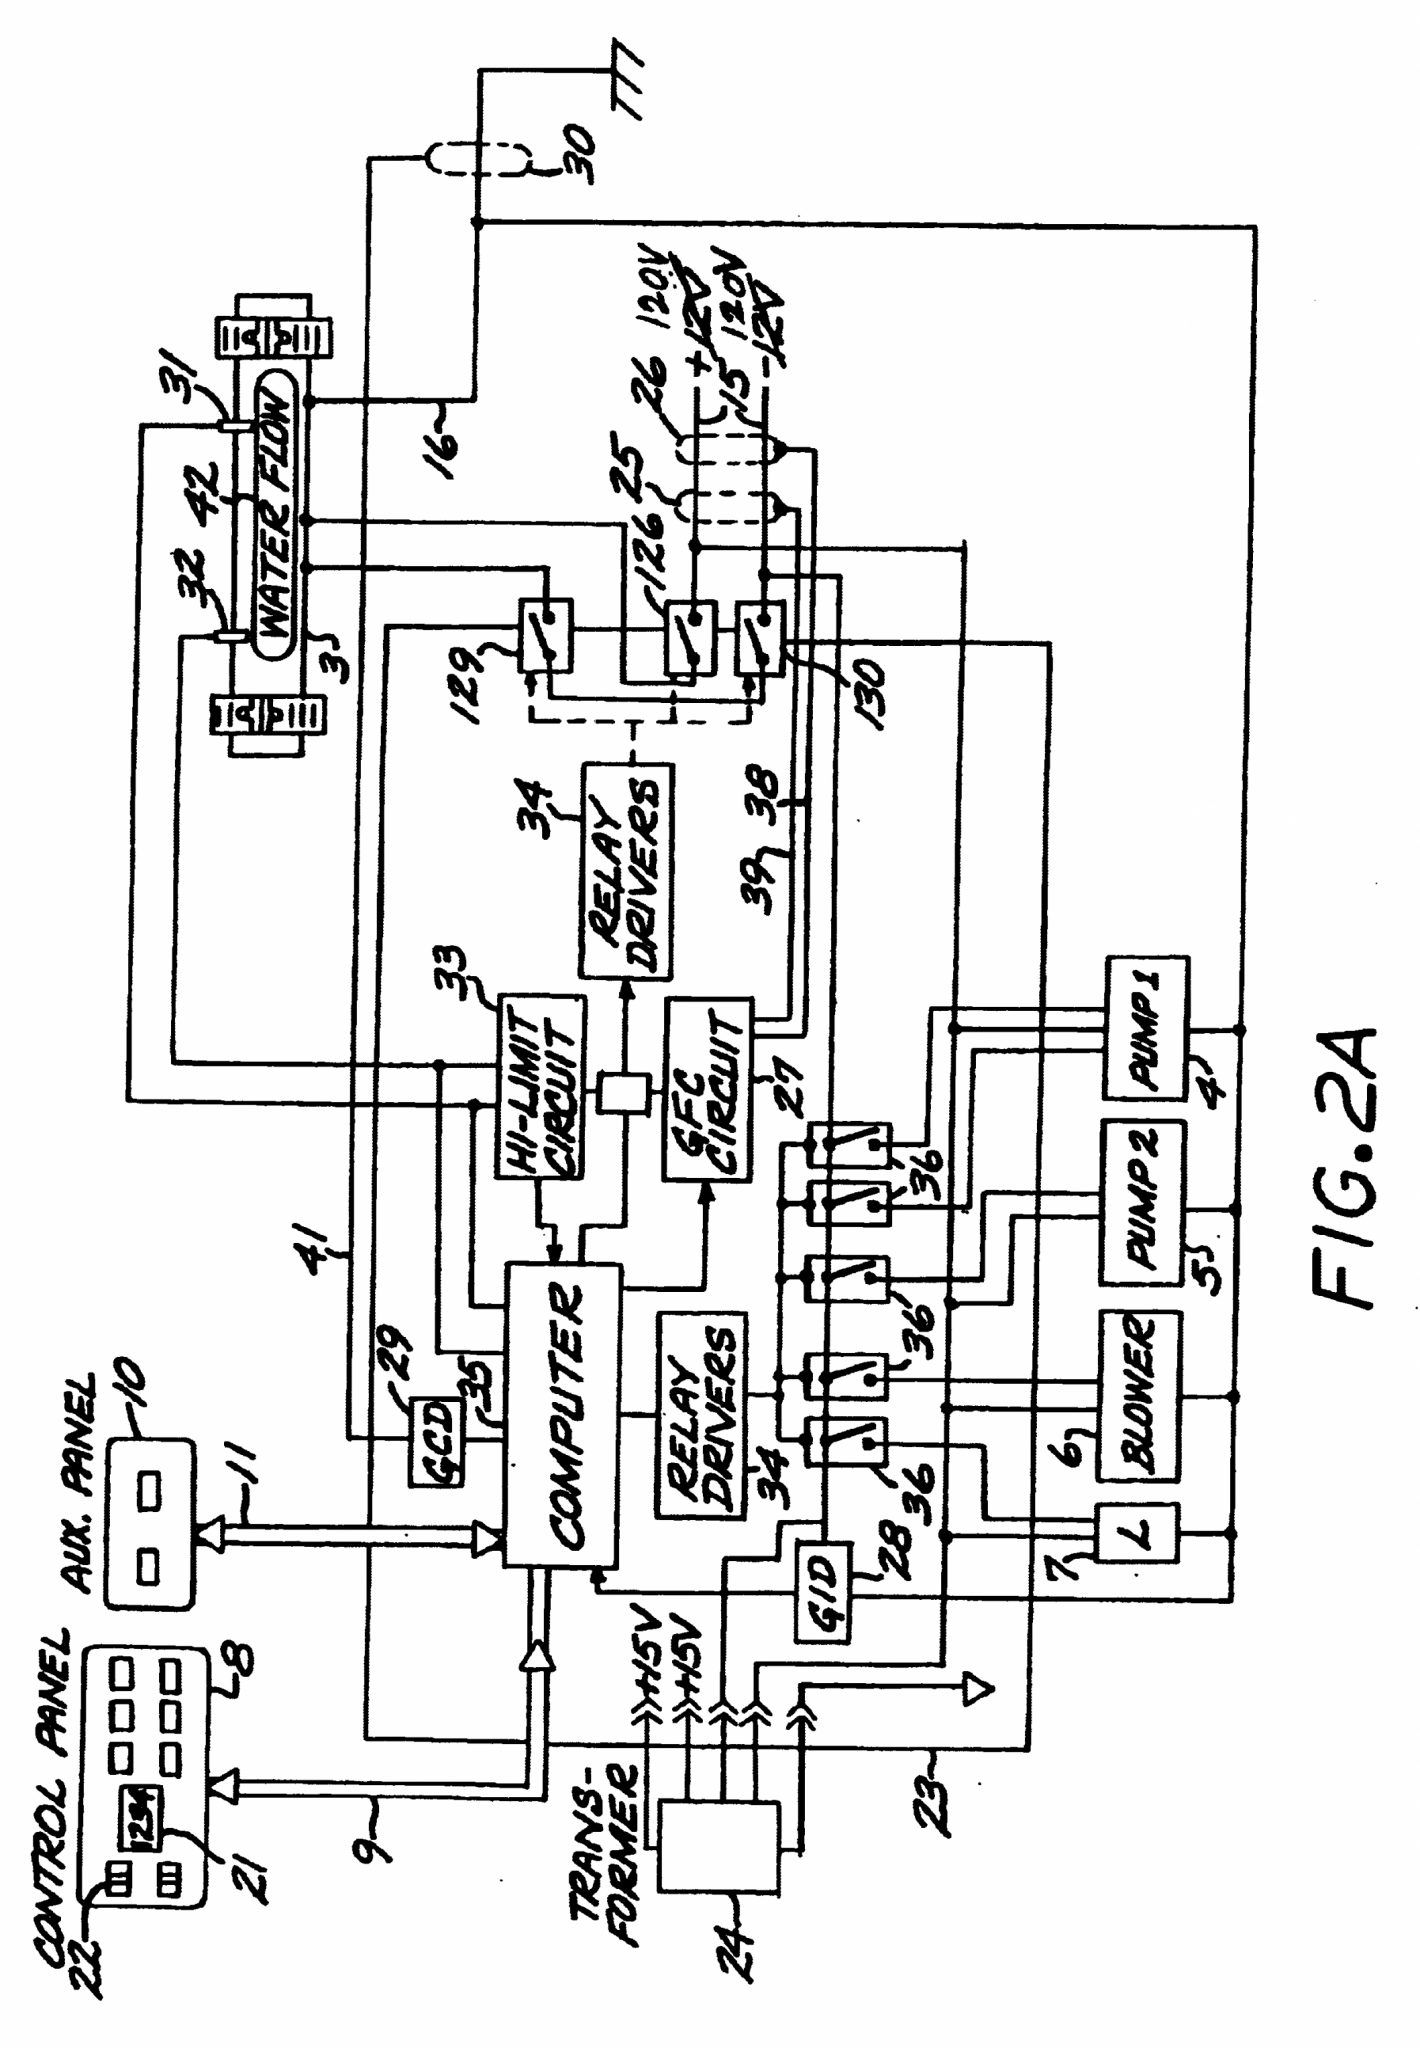 medium resolution of square d well pump pressure switch wiring diagram rh pinterest cl duplex pump control panel wiring diagram start stop station wiring diagram